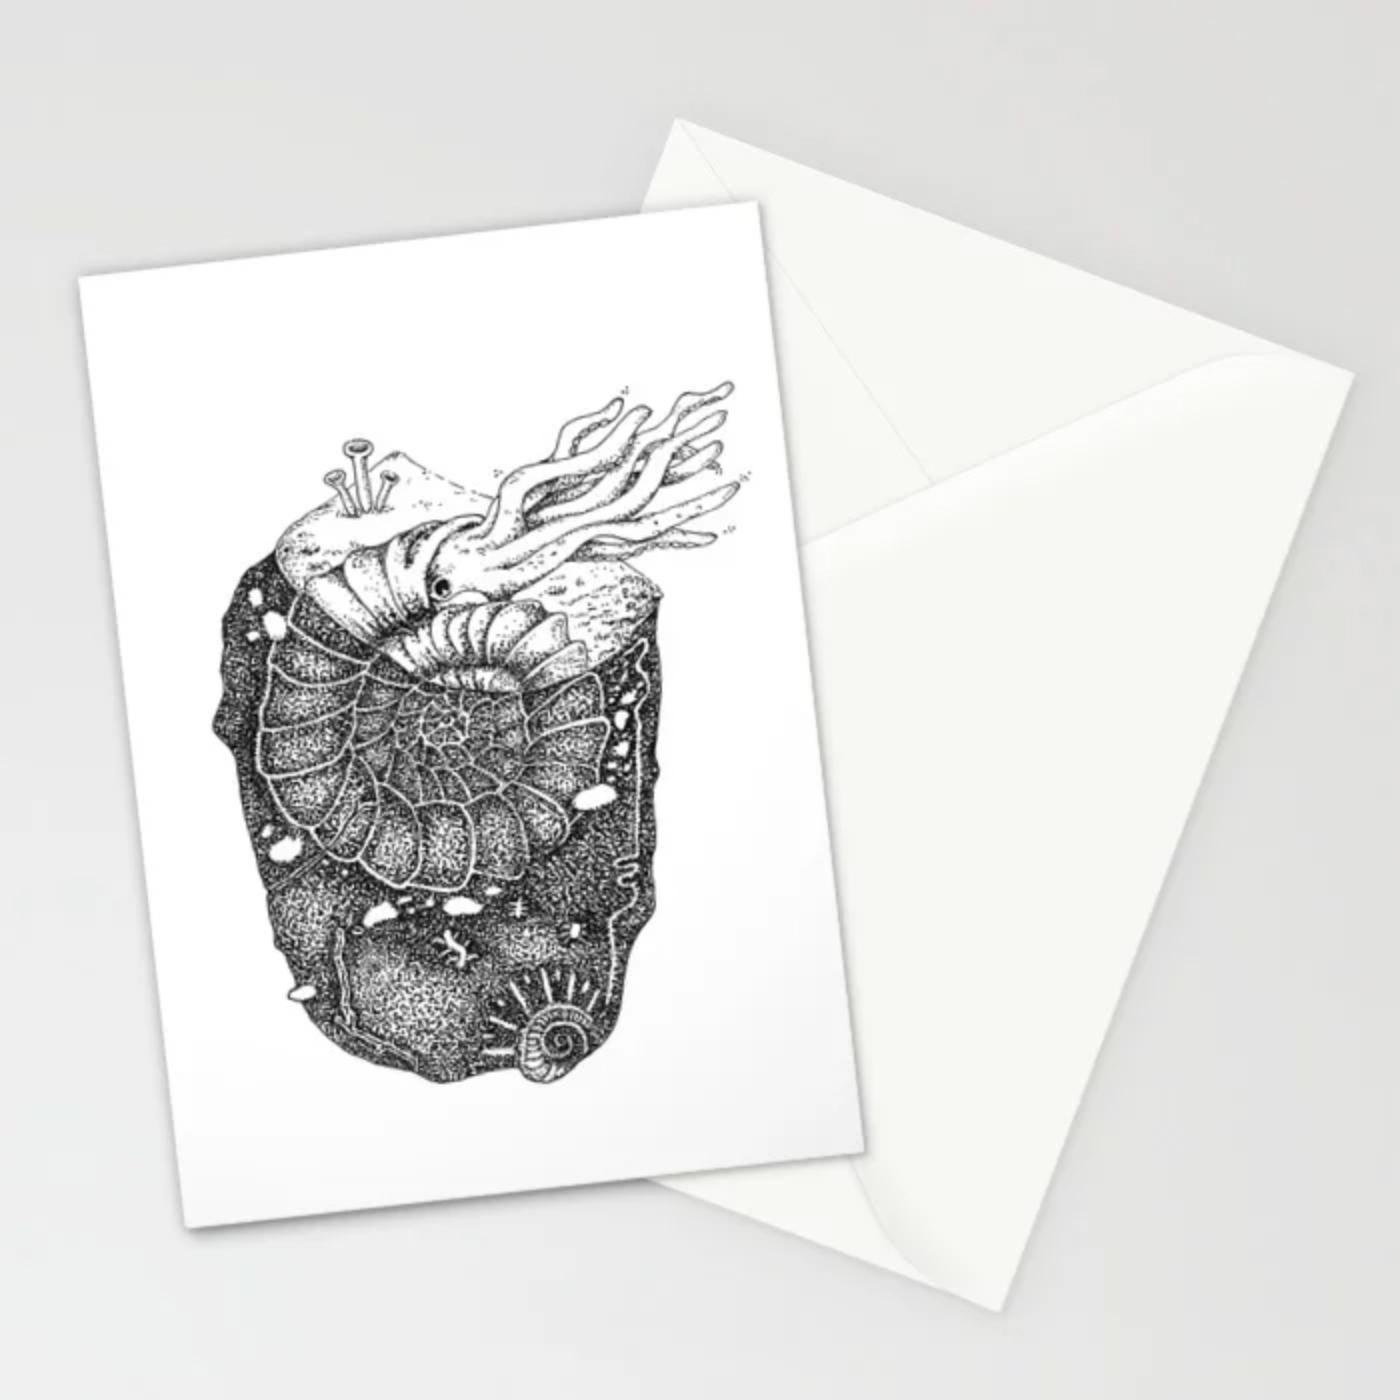 Fenne Kustermans, society6 artist, illustration, pen drawing, ammonite, fossil, rock hounding, www.Fenne.be